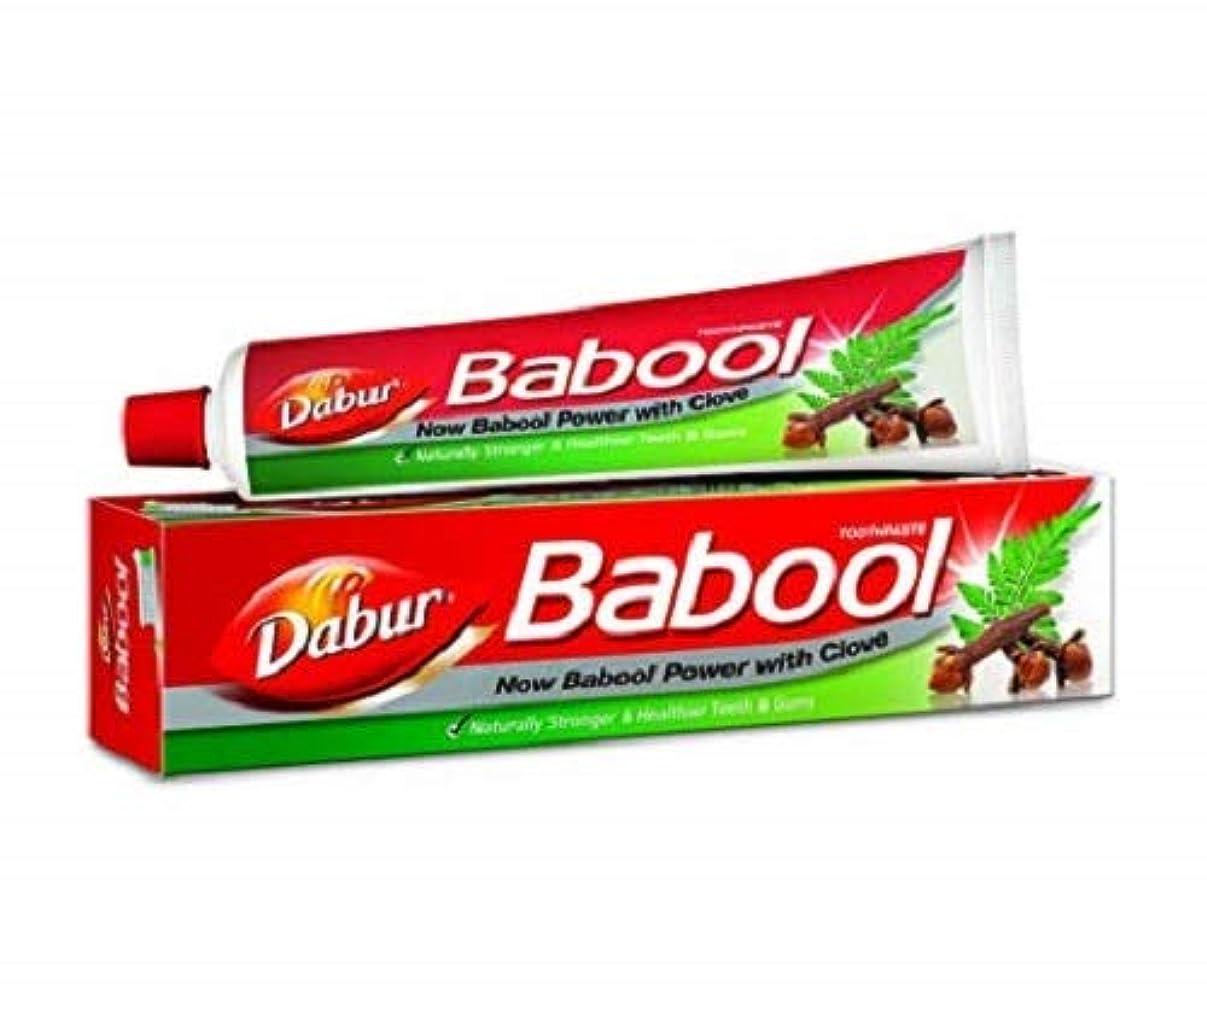 意識的一見暴力的なBabool Toothpaste 190g toothpaste by Dabur